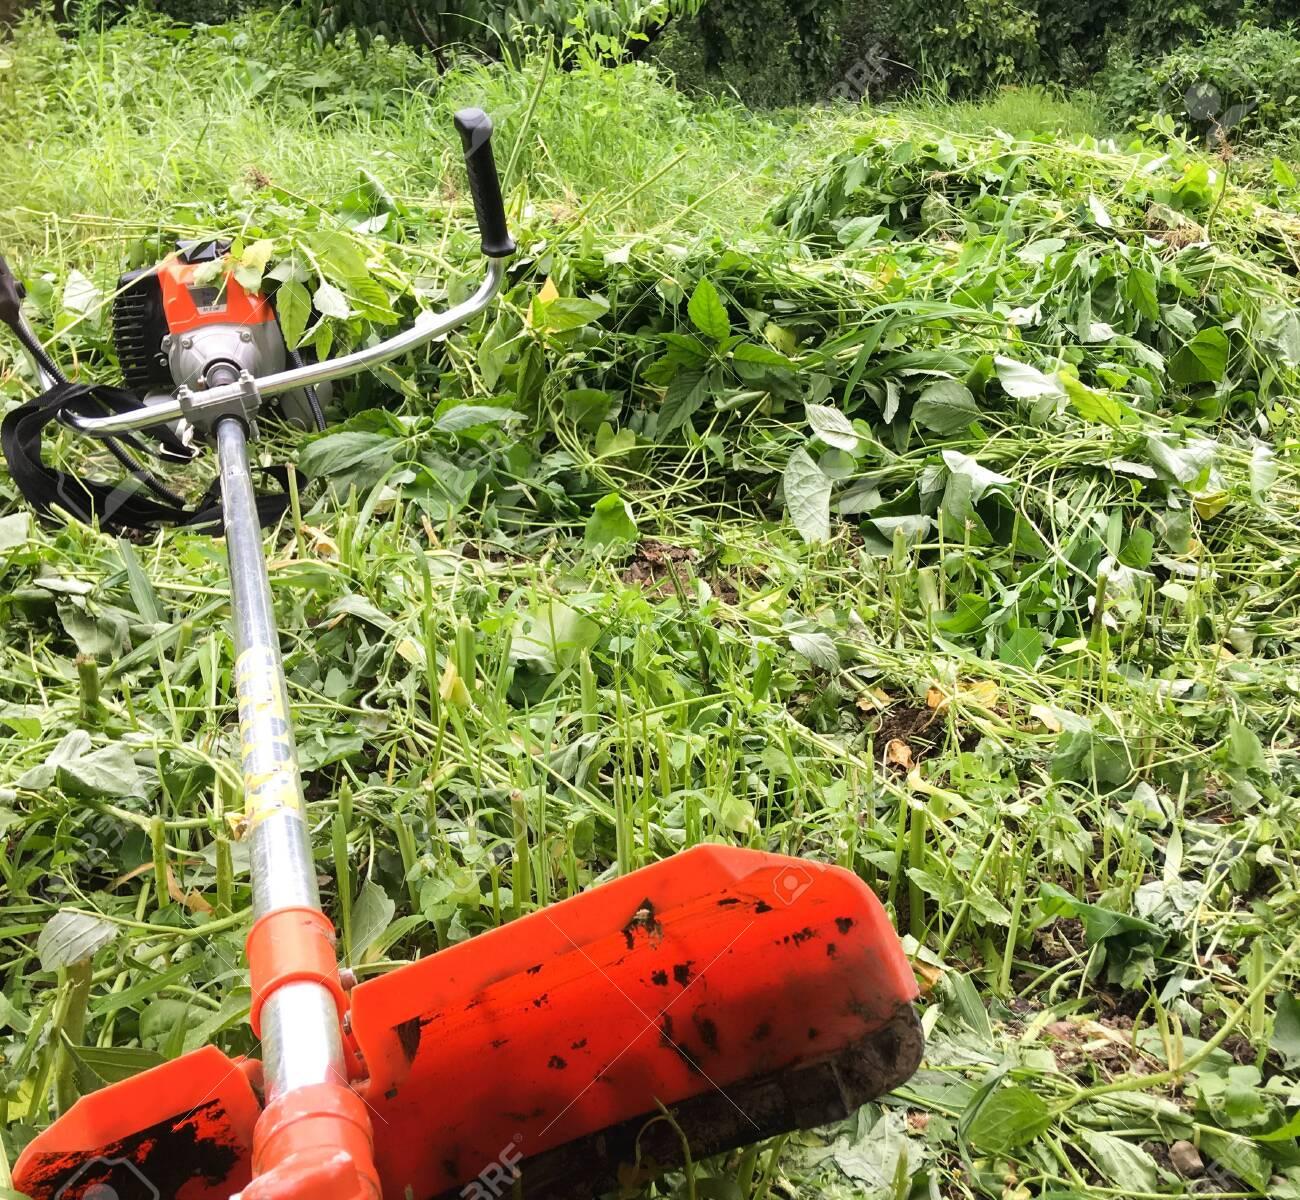 Lawn mower, grass, equipment, mow gardener care work tool - 148013006